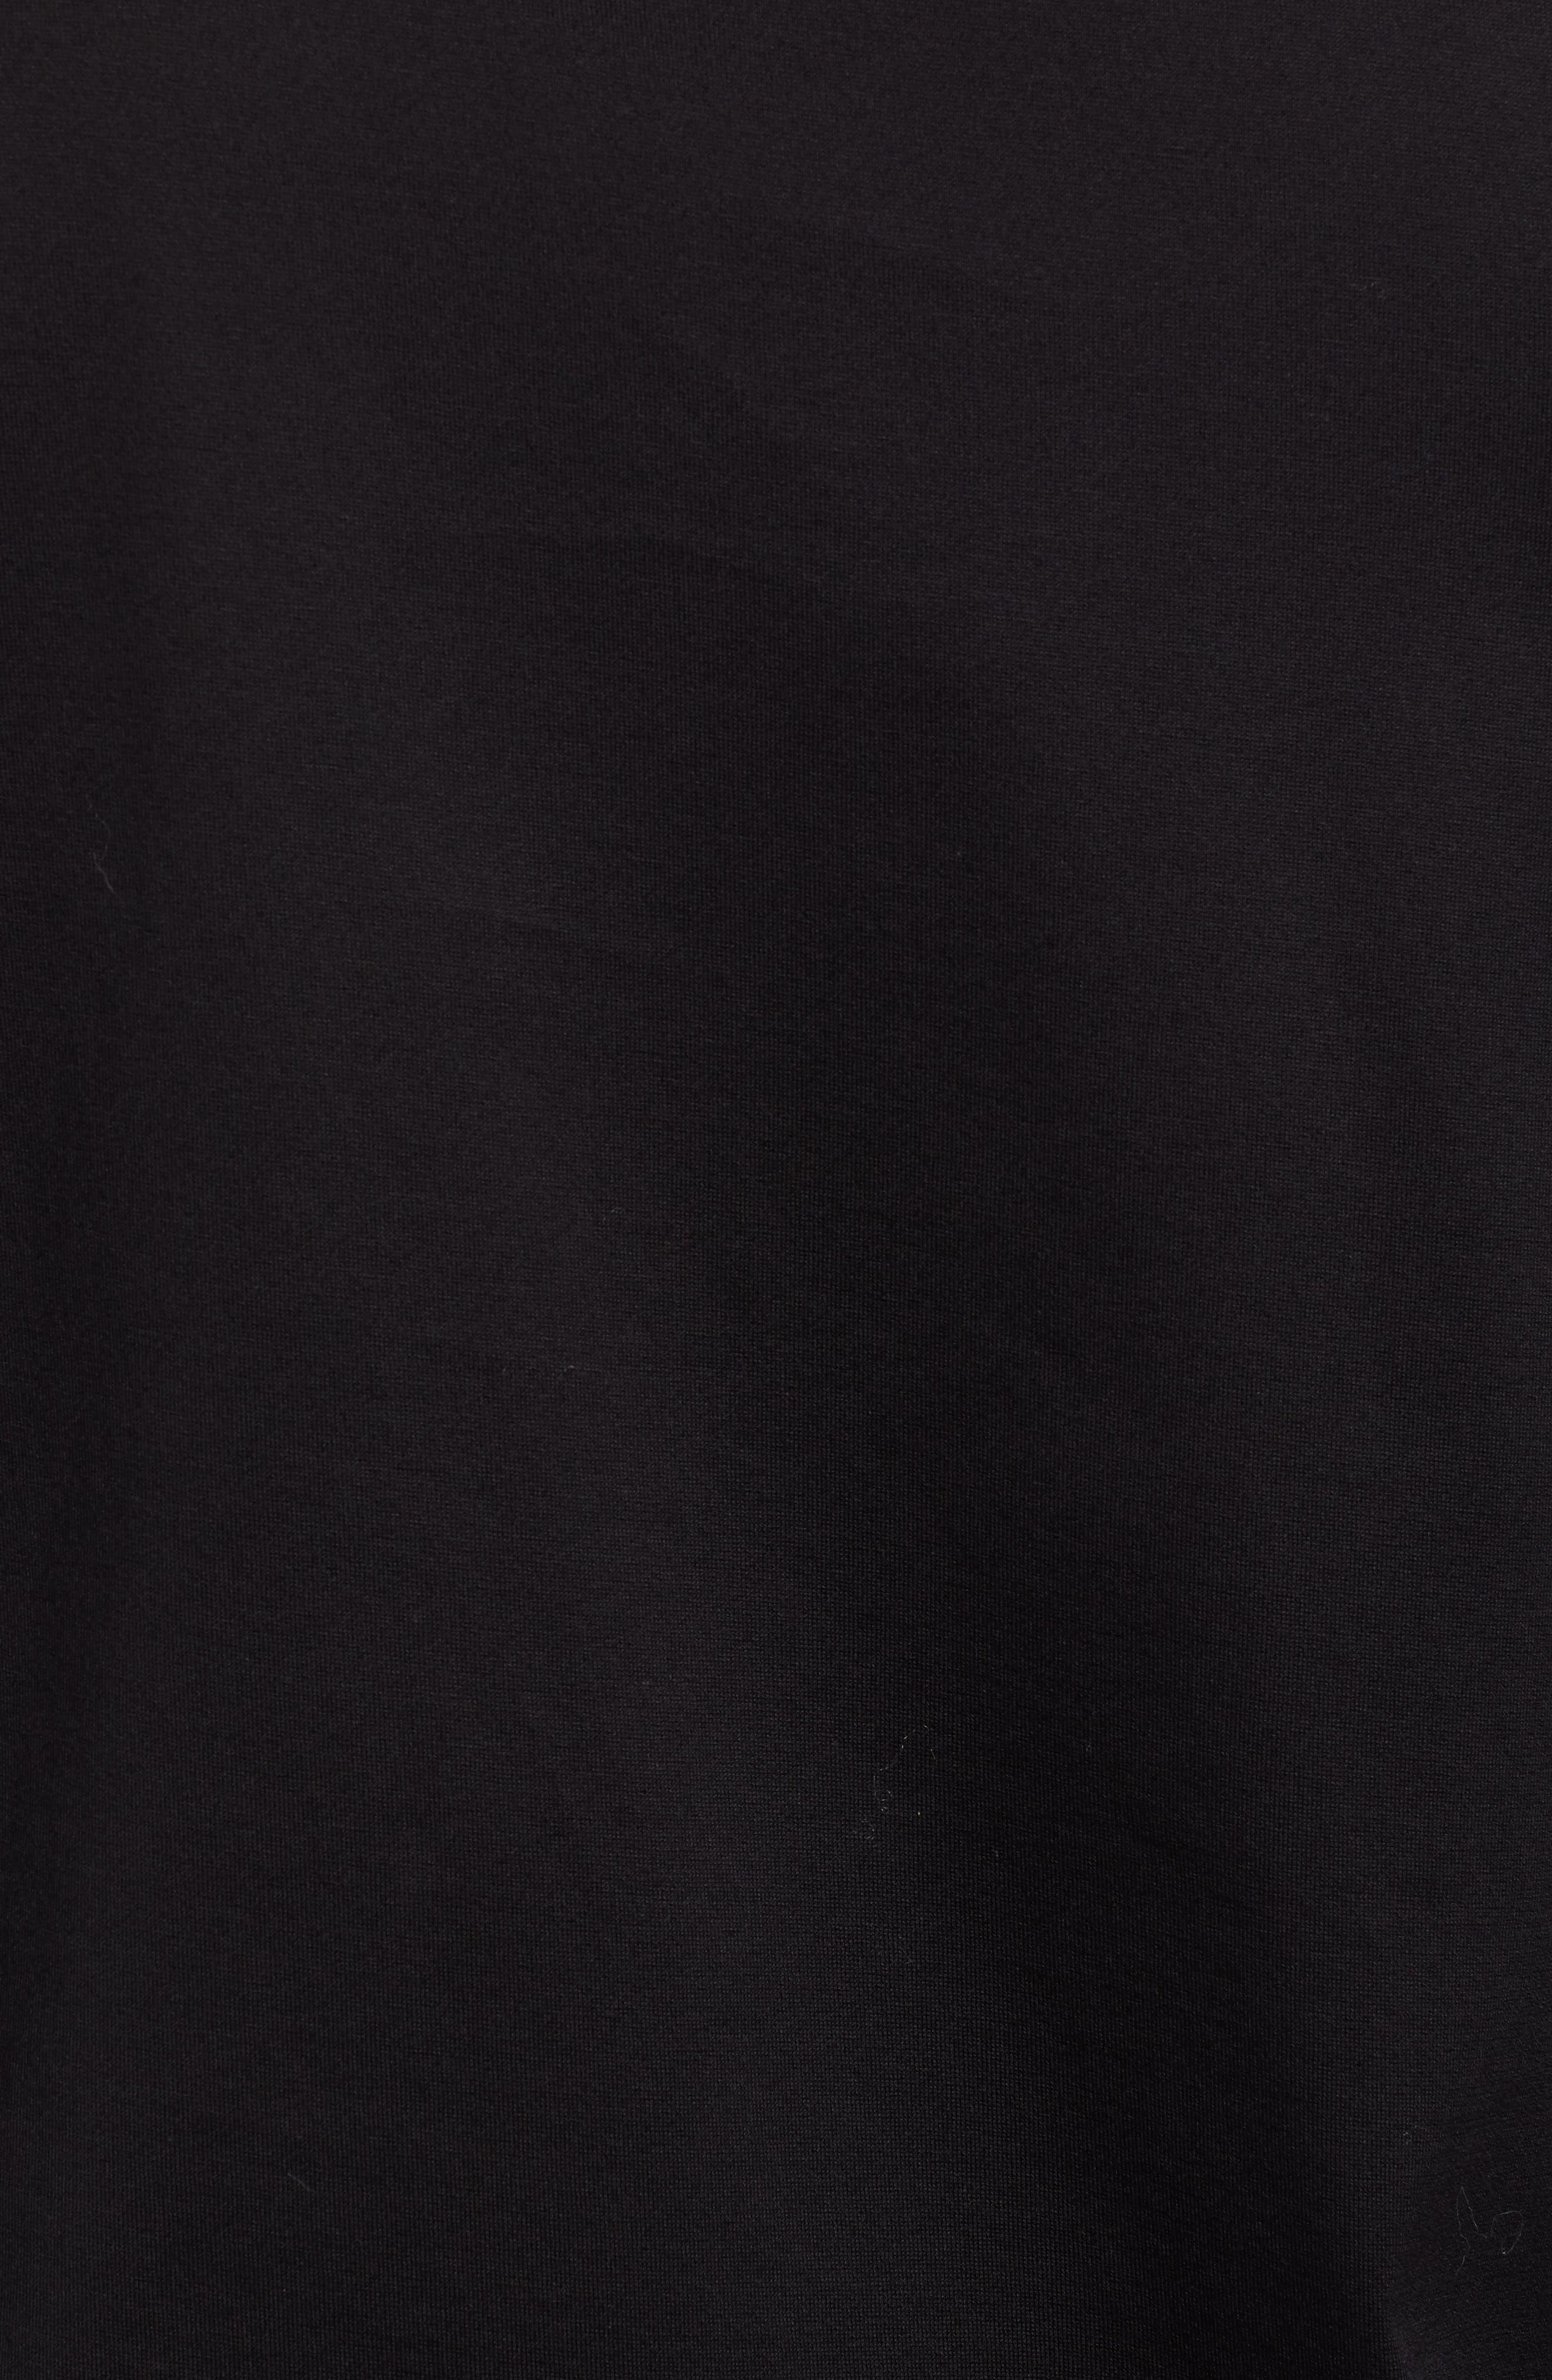 Dalendar Mercerized Cotton Slim Fit Polo Shirt,                             Alternate thumbnail 5, color,                             BLACK